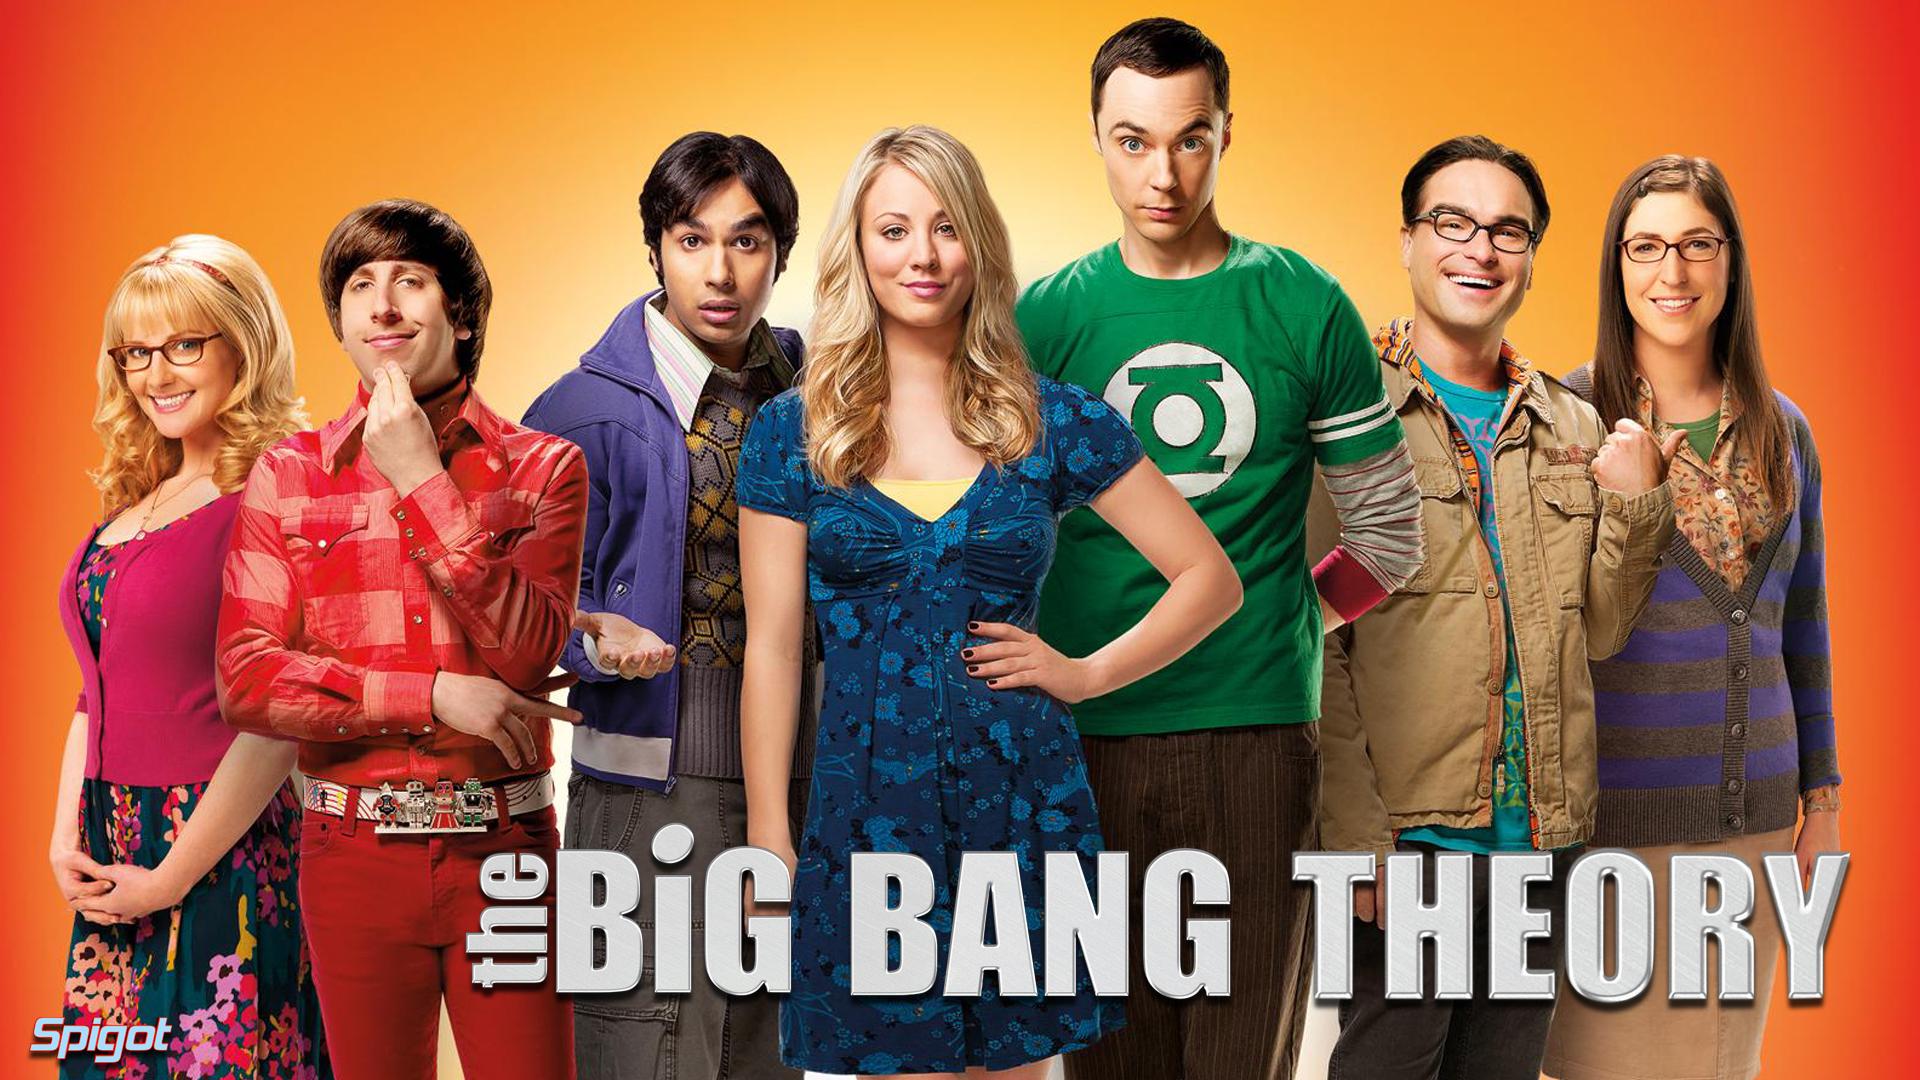 The Big Bang Theory Is Finally Ending